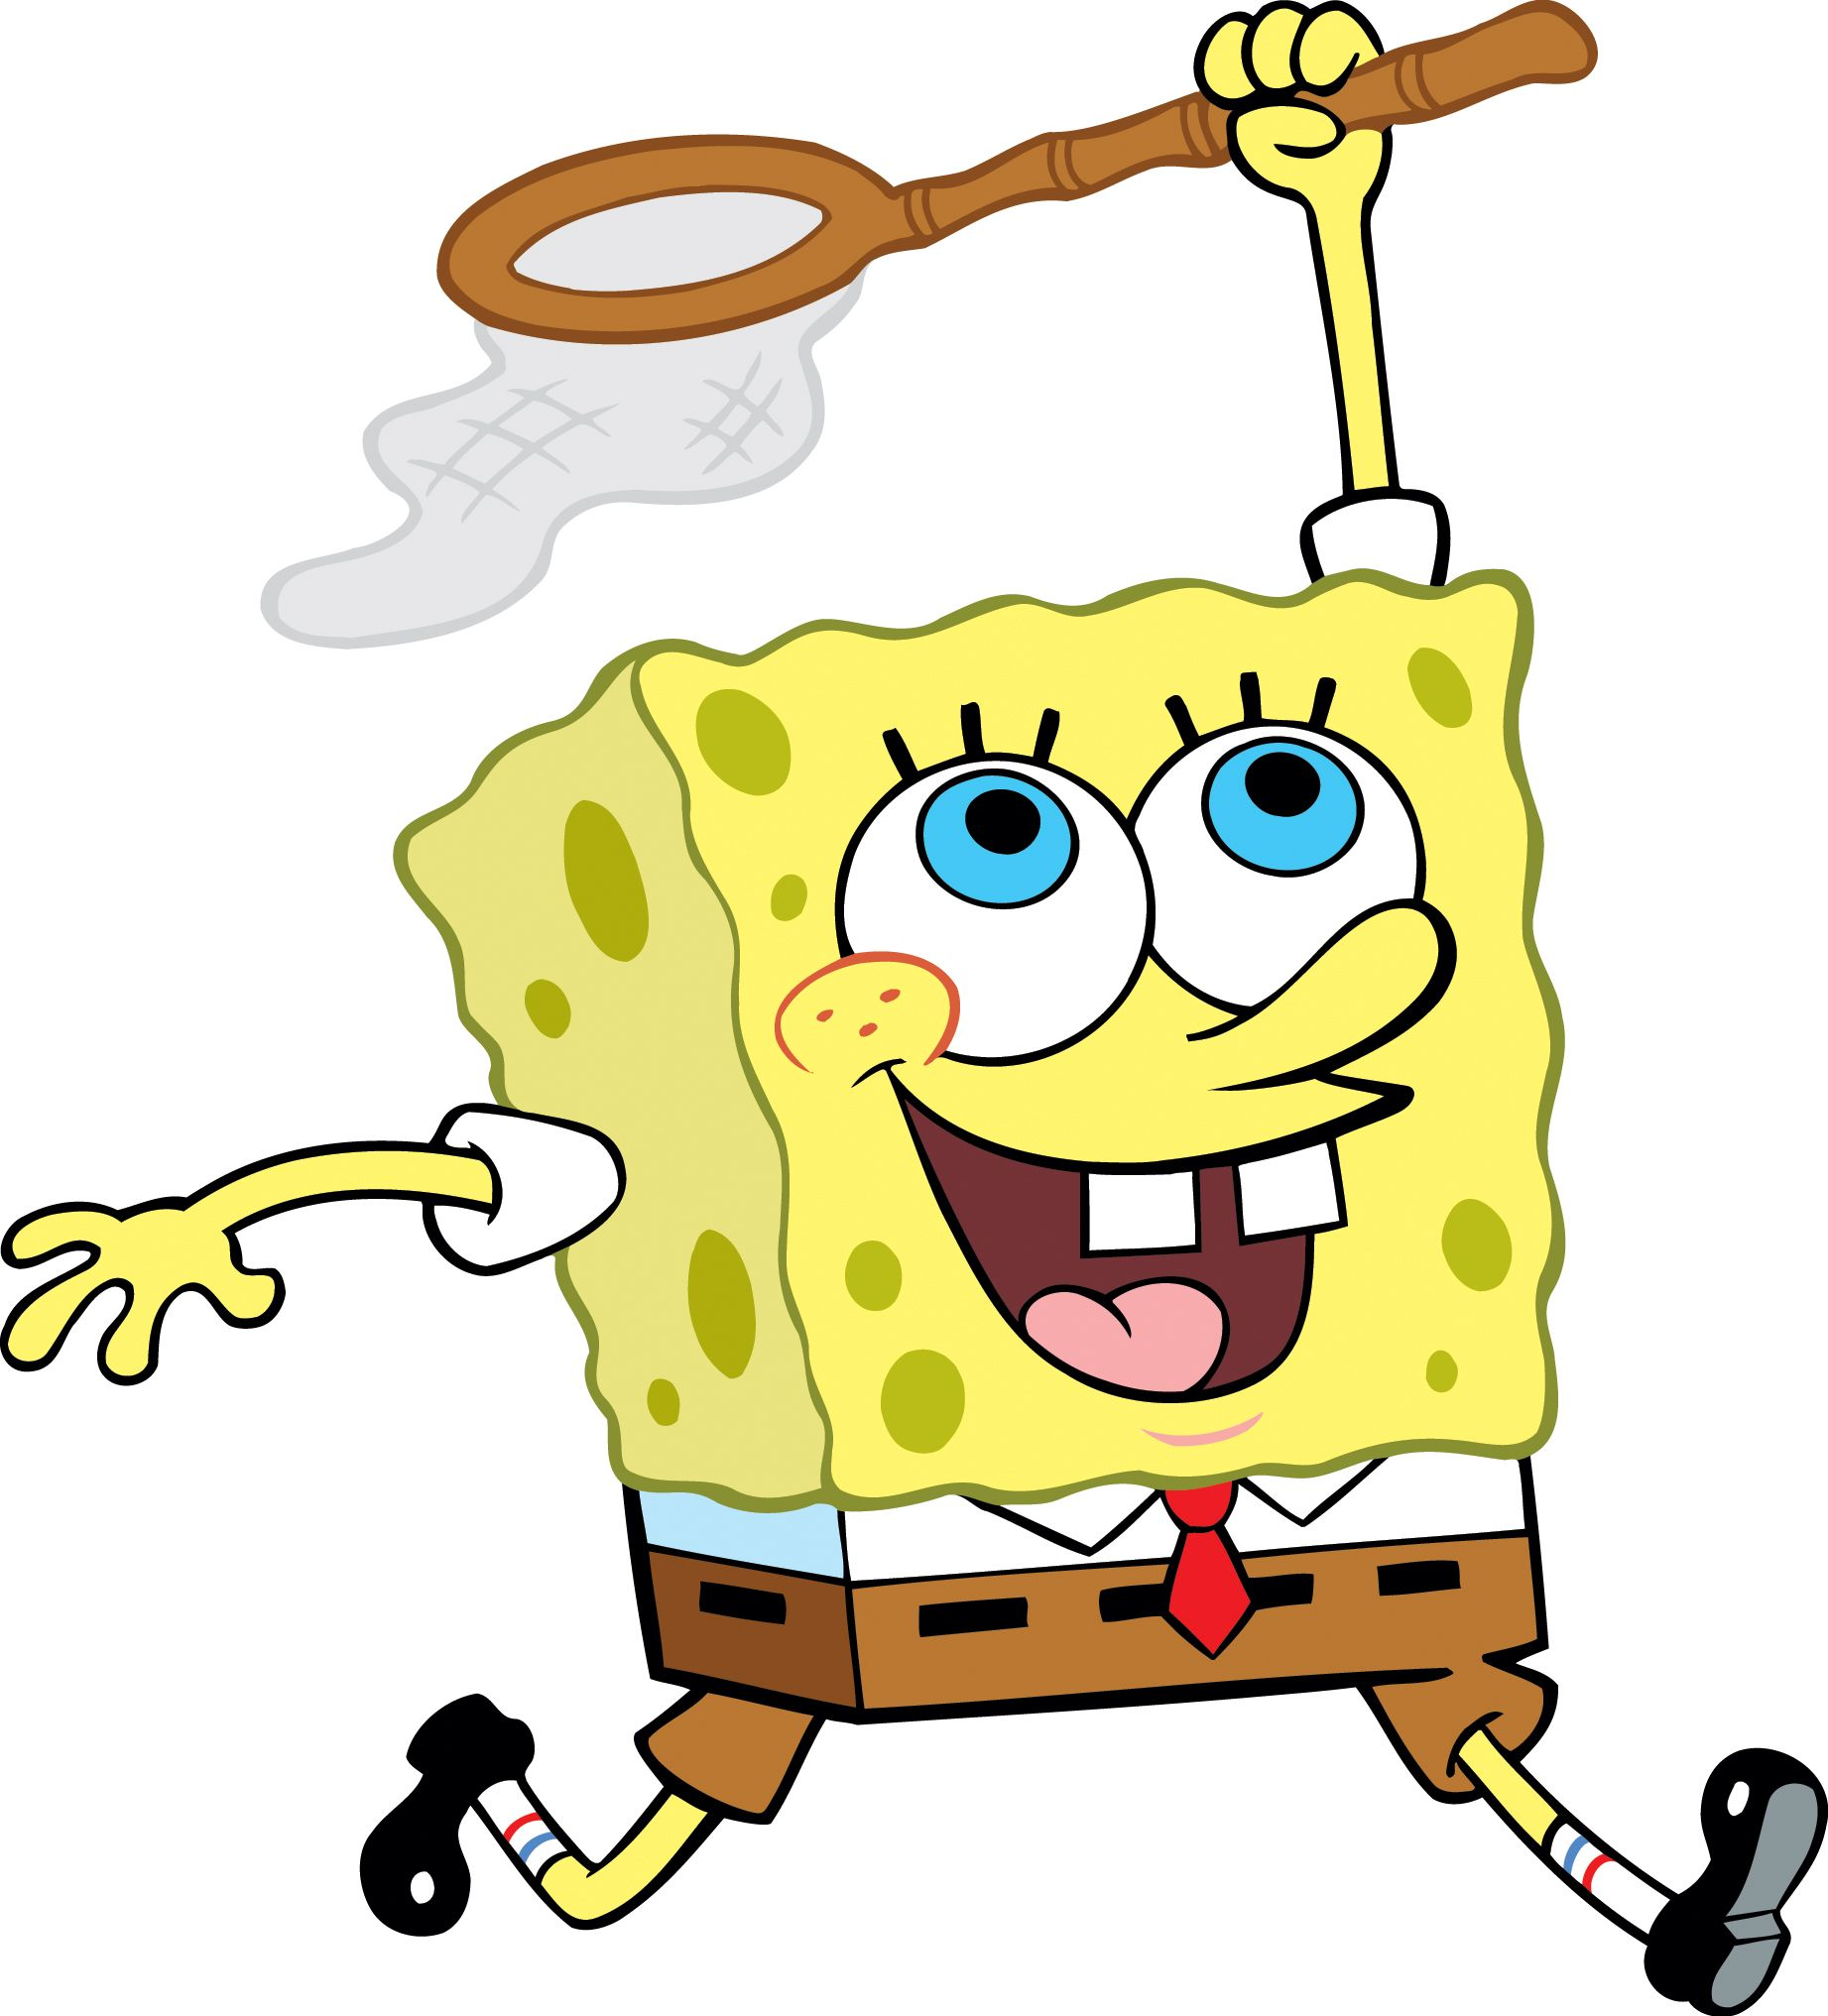 Spongebob Squarepants Photo Spongebob Spongebob Wallpaper Spongebob Painting Spongebob